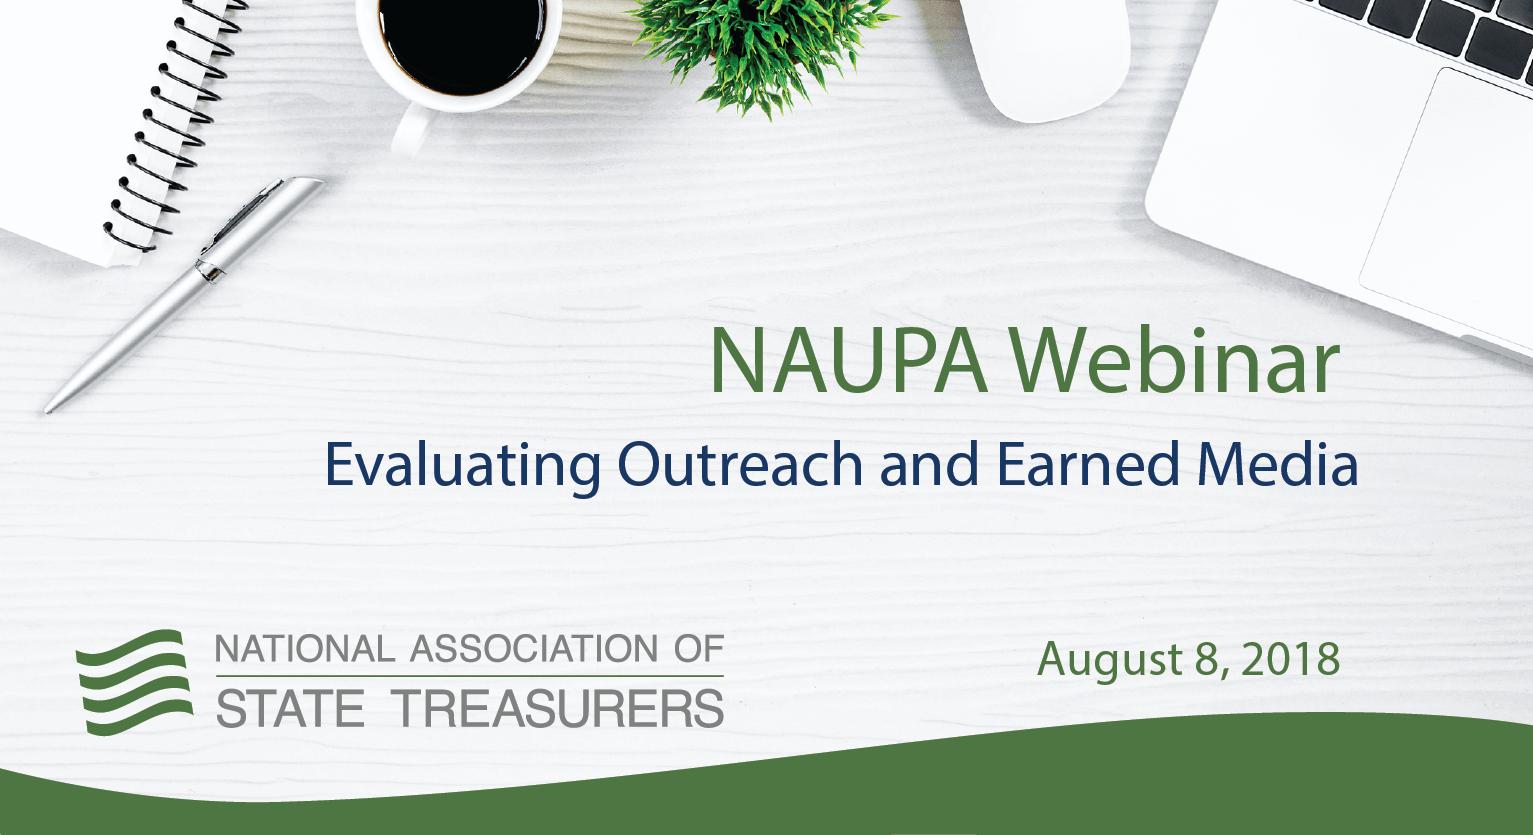 NAUPA Webinar - Elevating Outreach and Earned Media